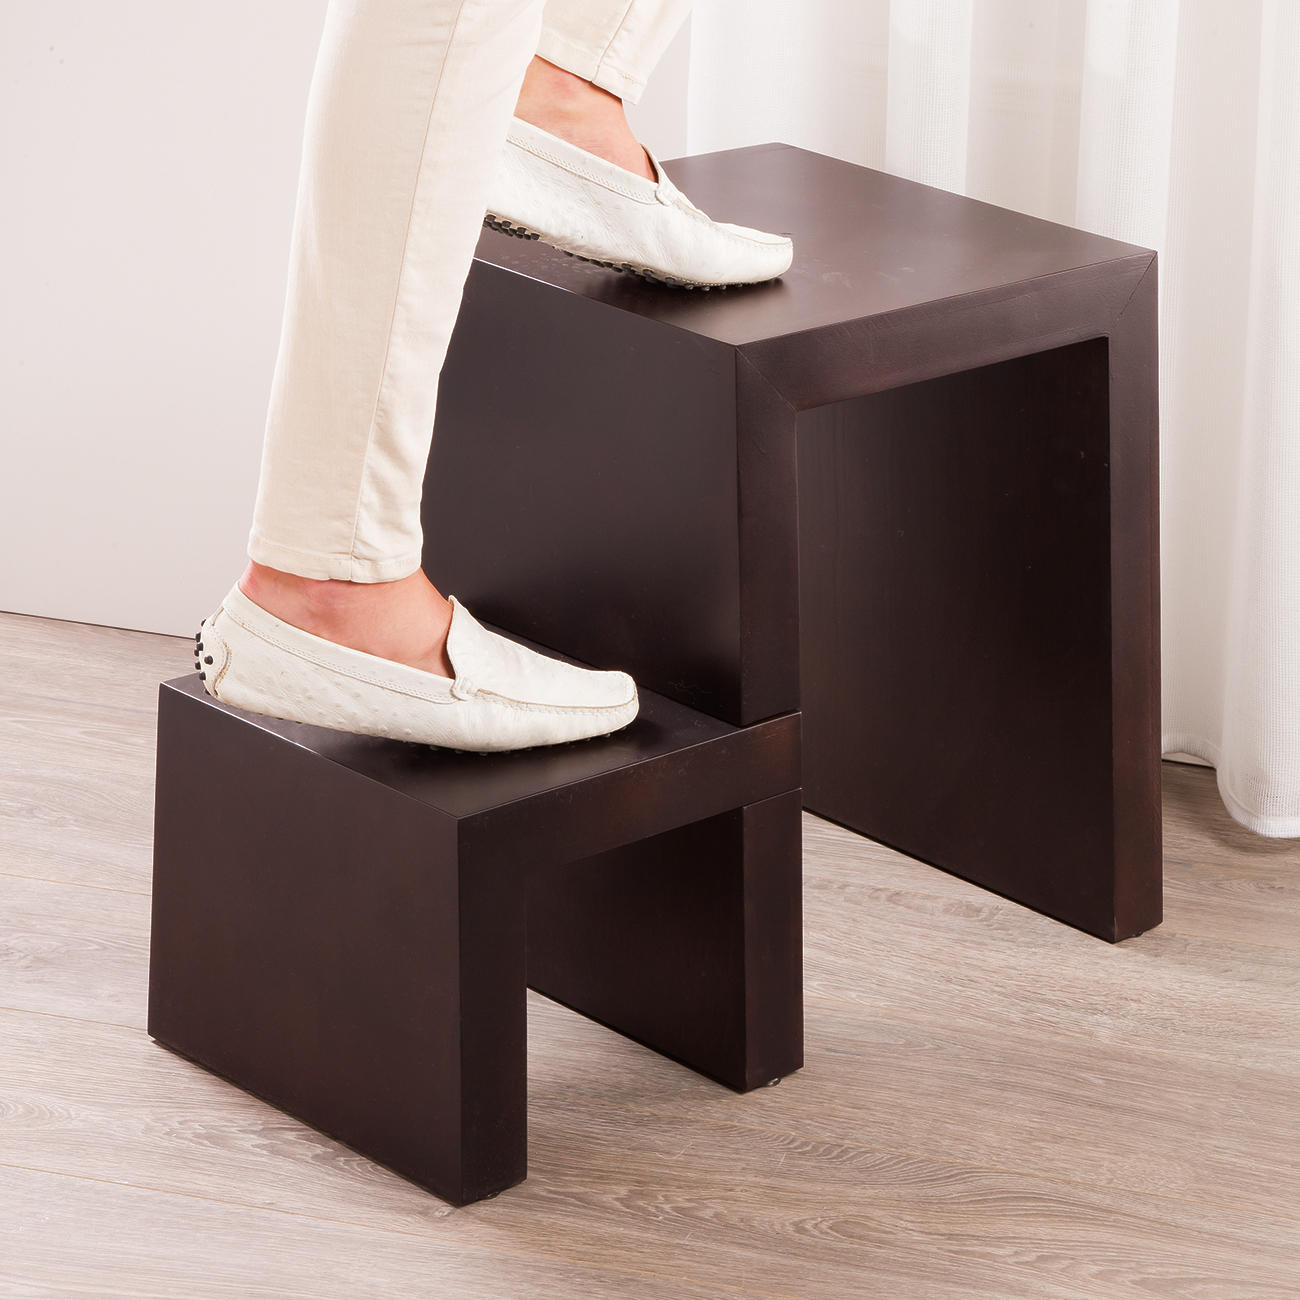 design stufenhocker 3 jahre garantie pro idee. Black Bedroom Furniture Sets. Home Design Ideas